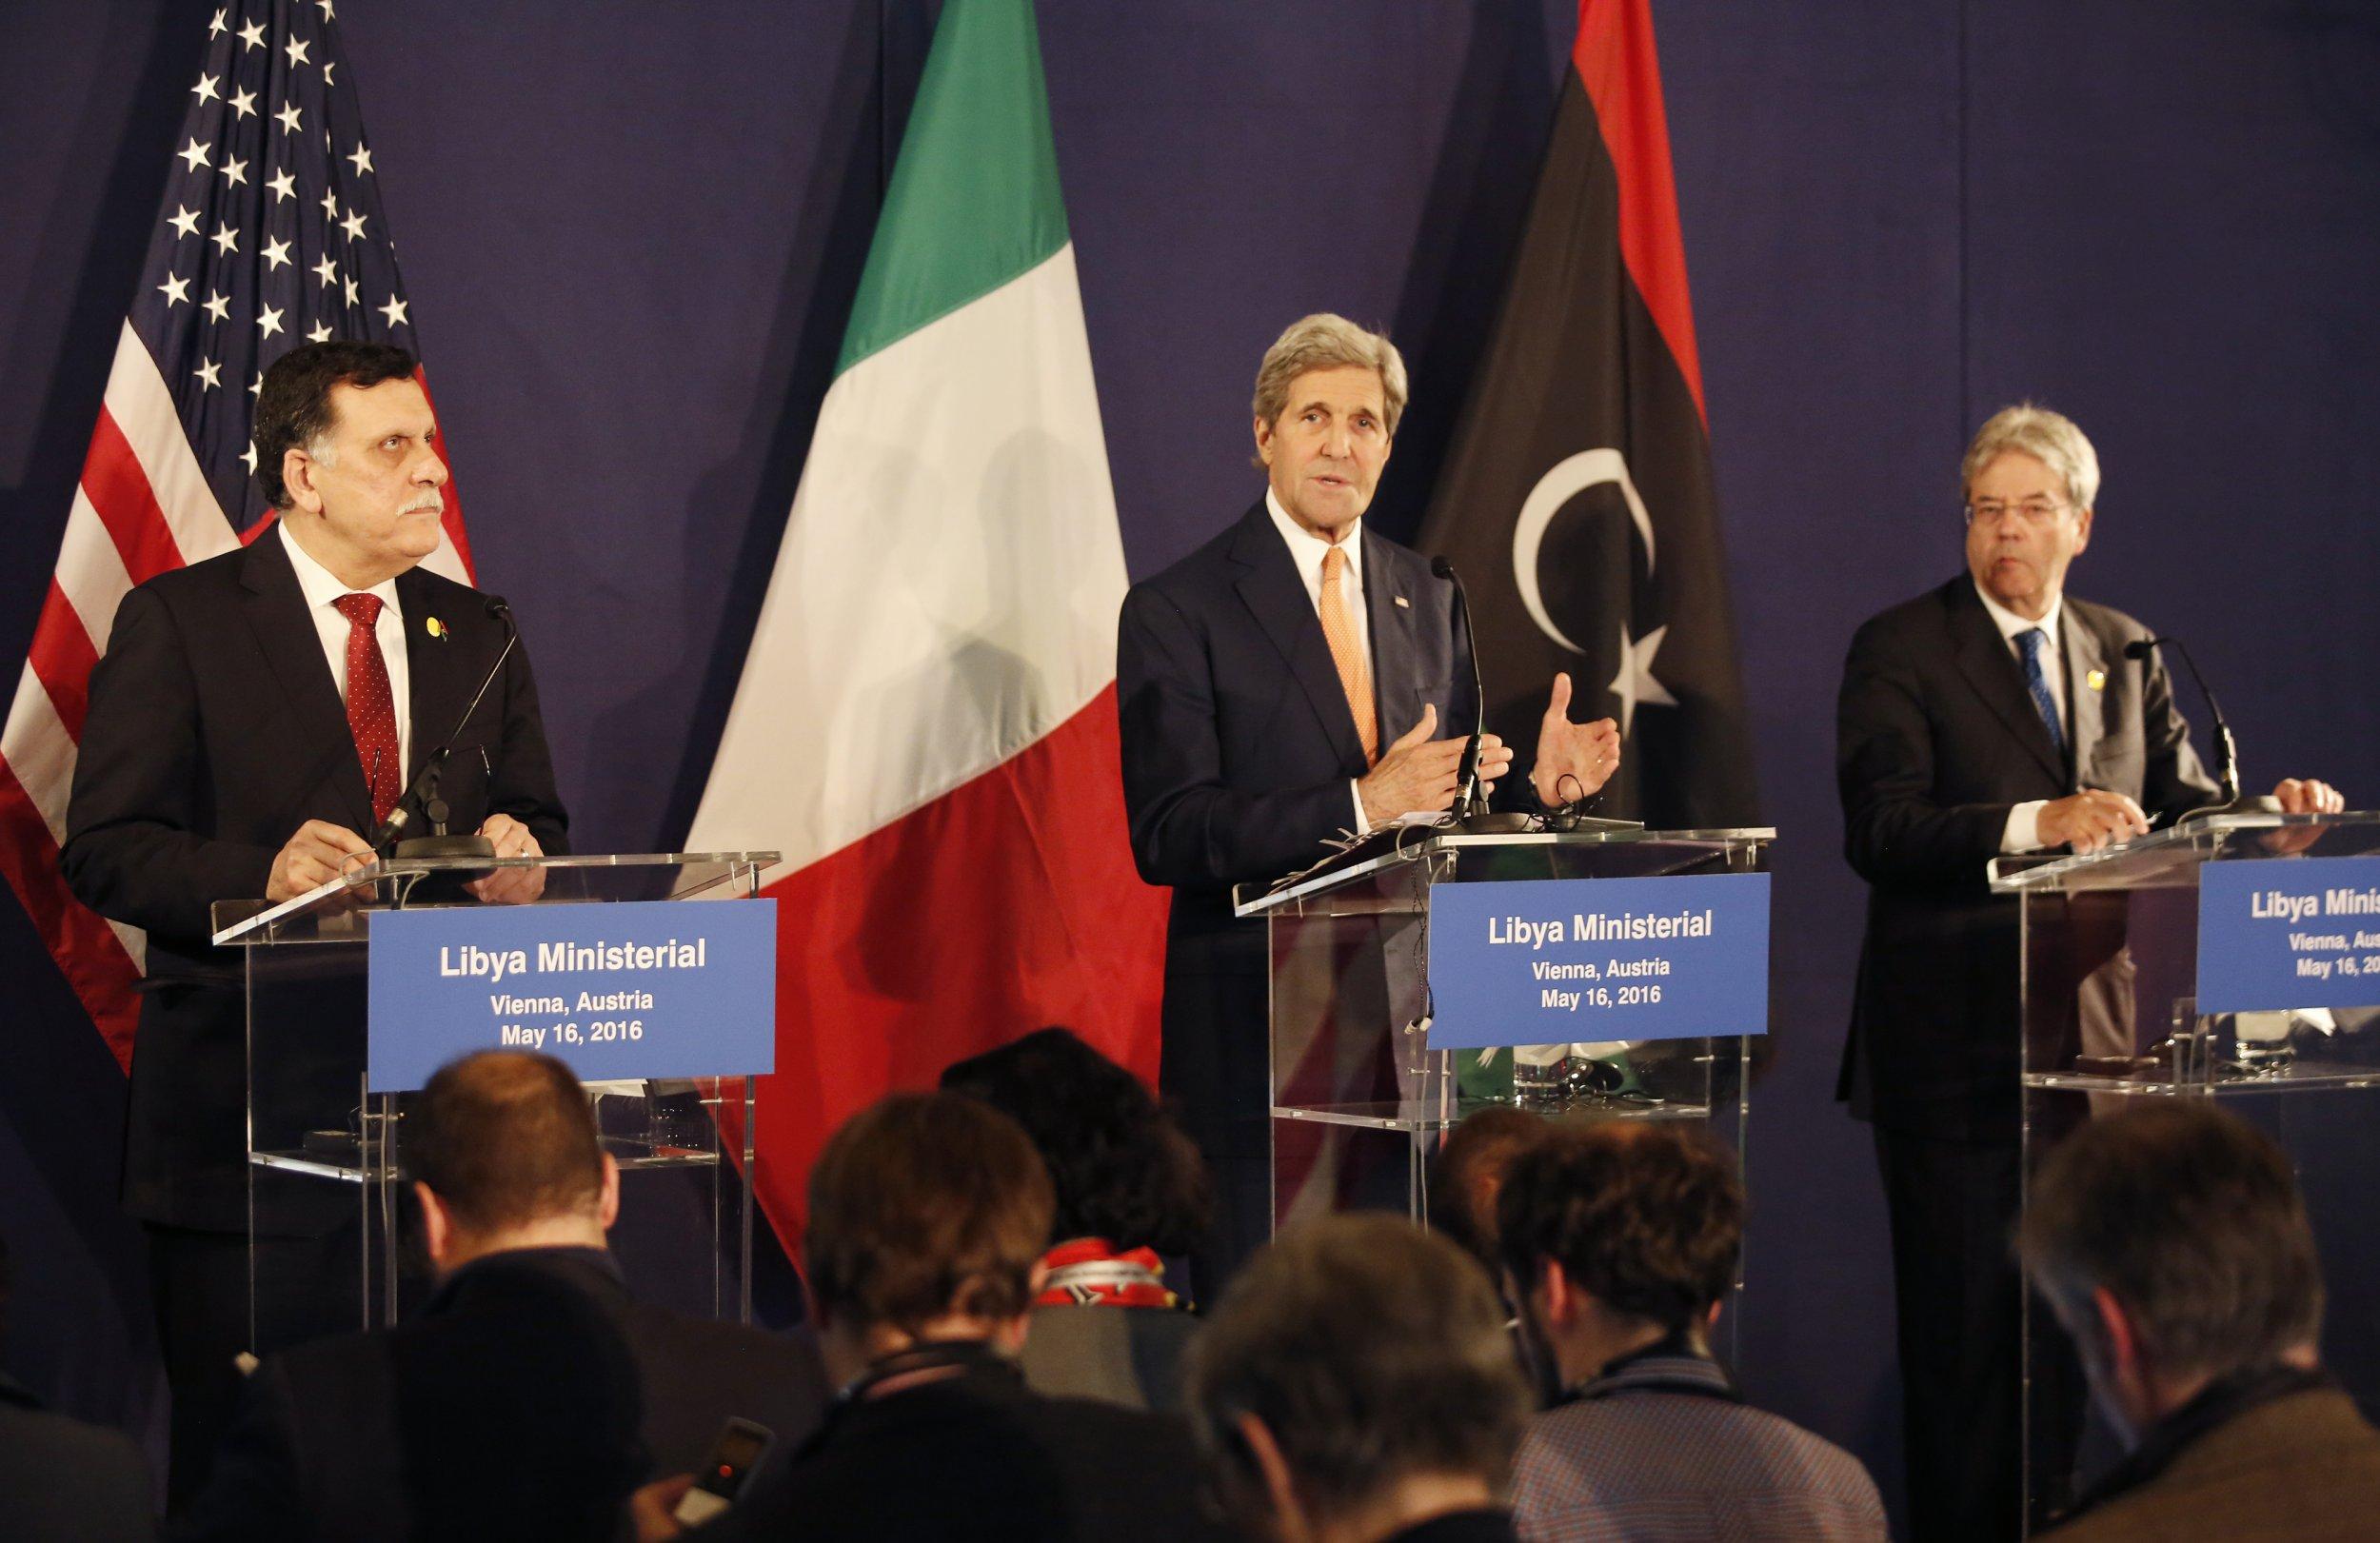 John Kerry and others at Vienna talks on Libya